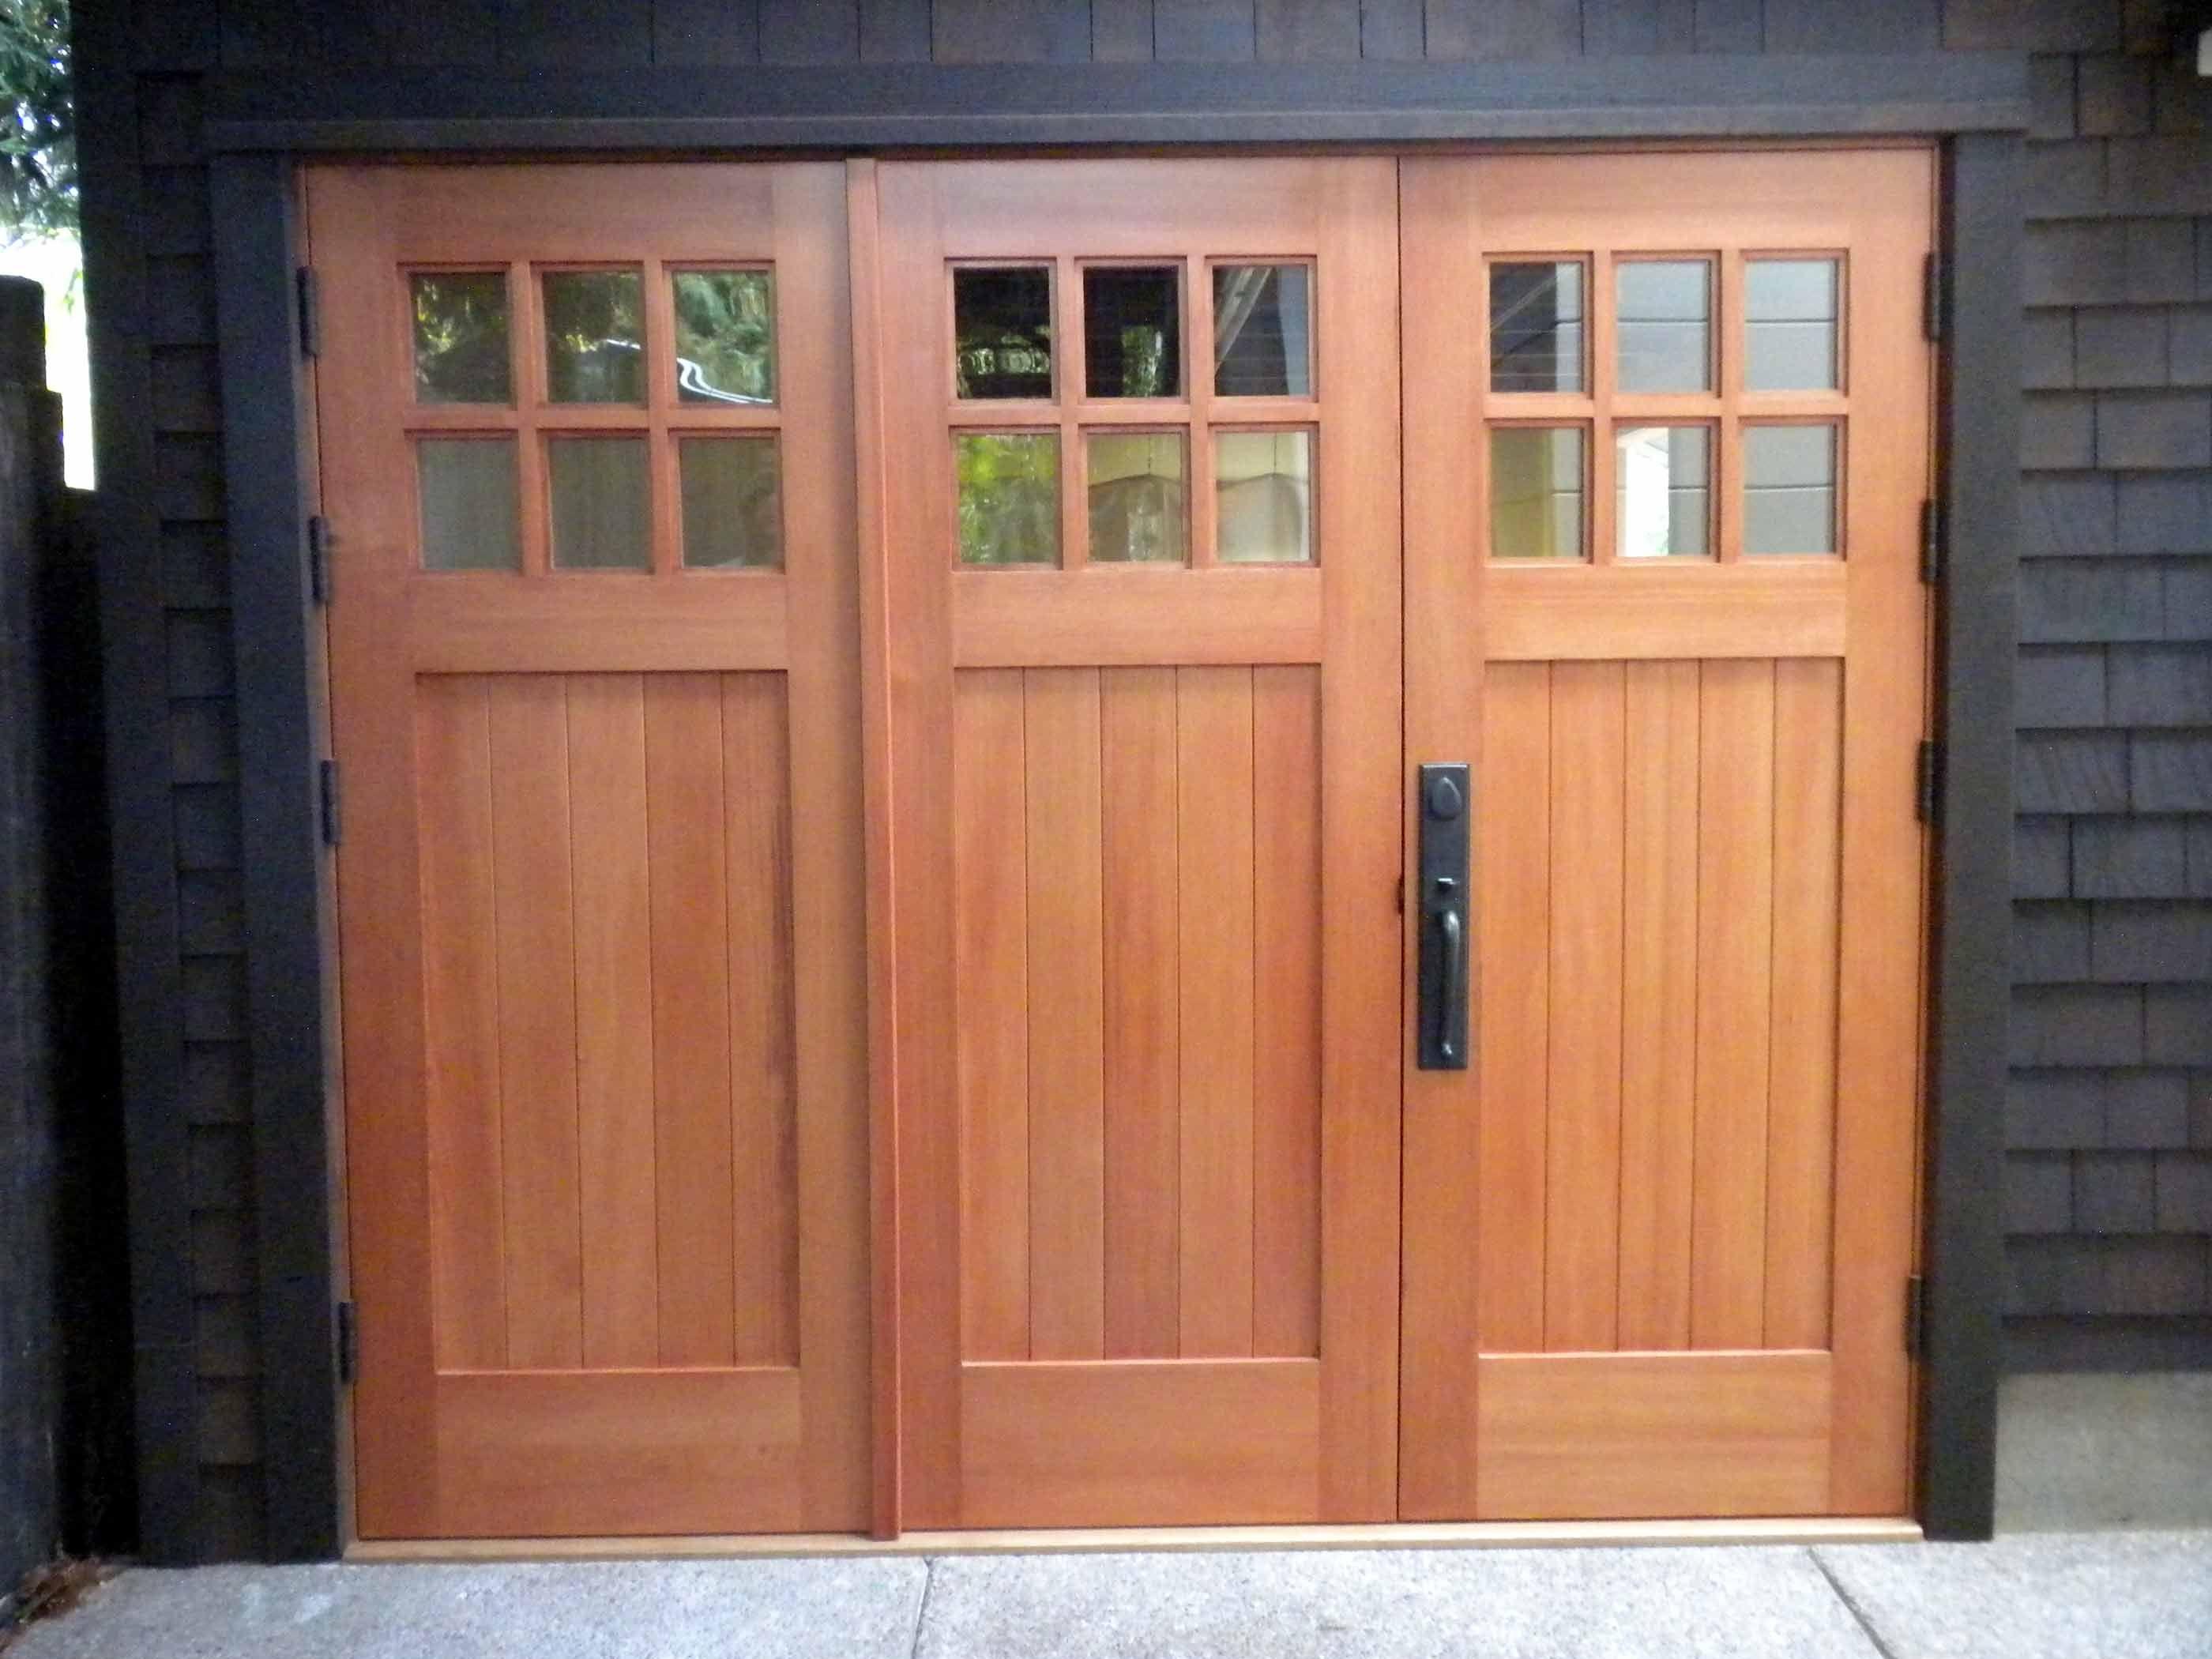 Folding Doors From Real Carriage Door Sliding Hardware Garage